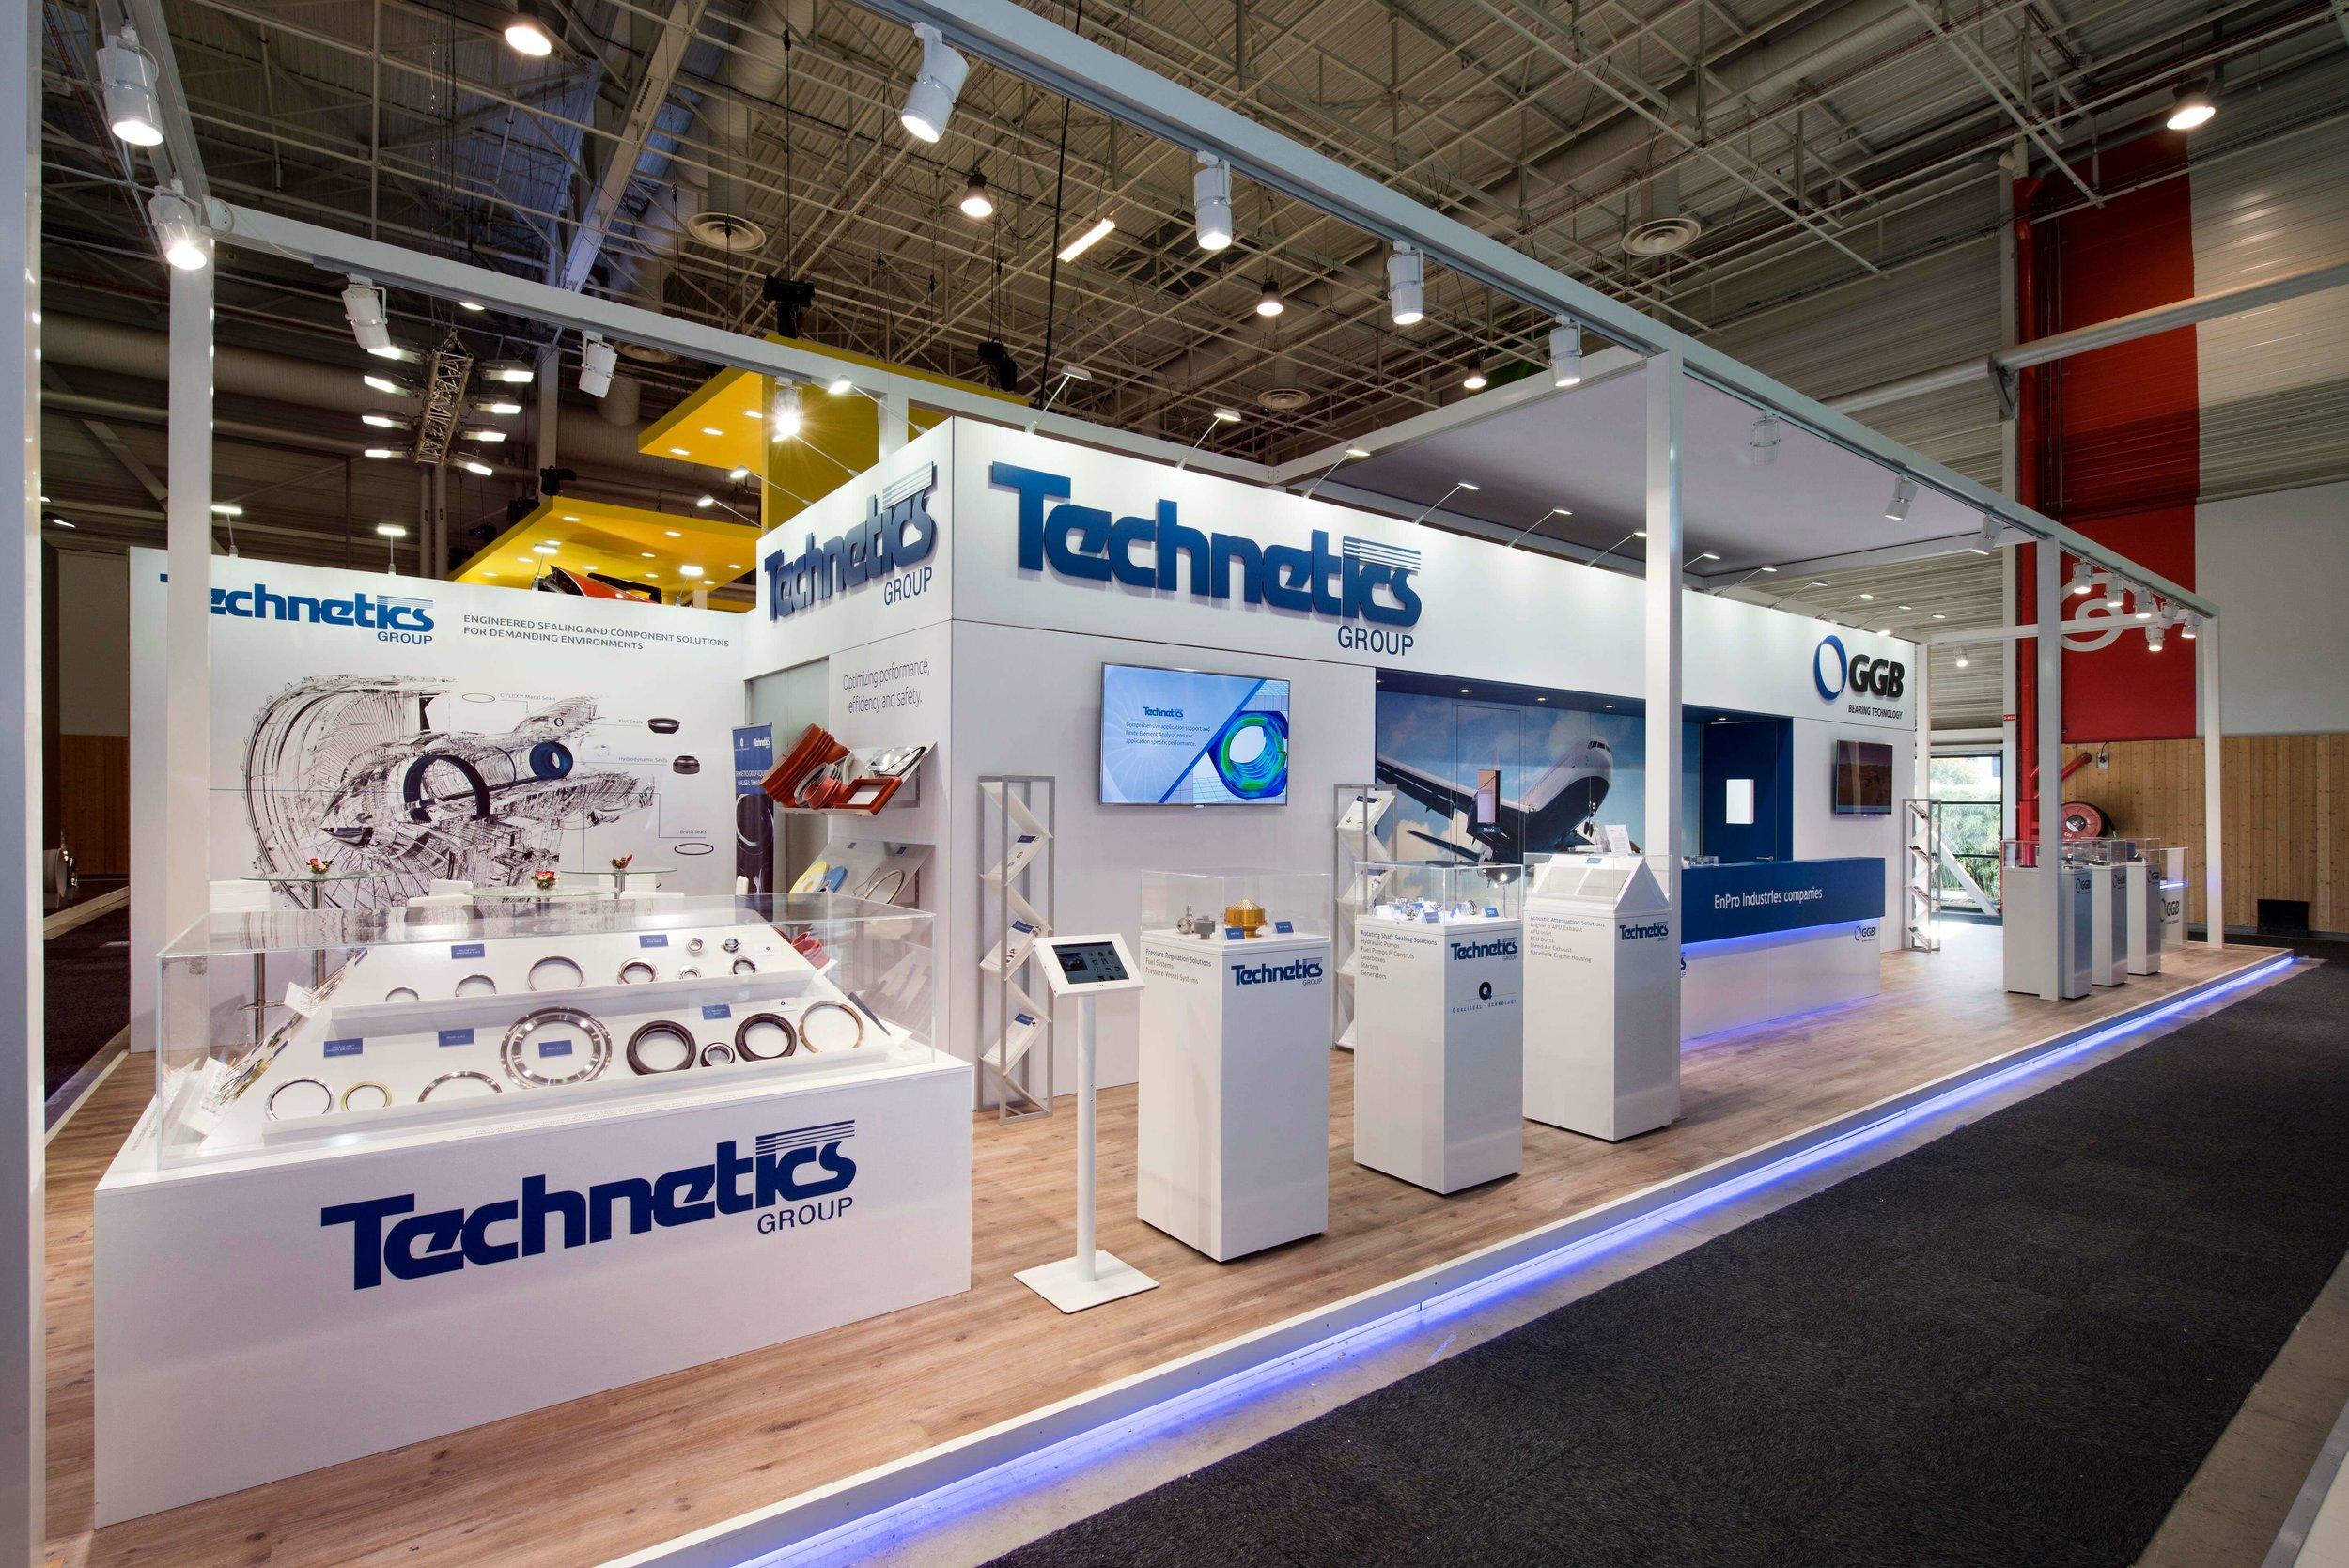 Technetics-0864.jpg